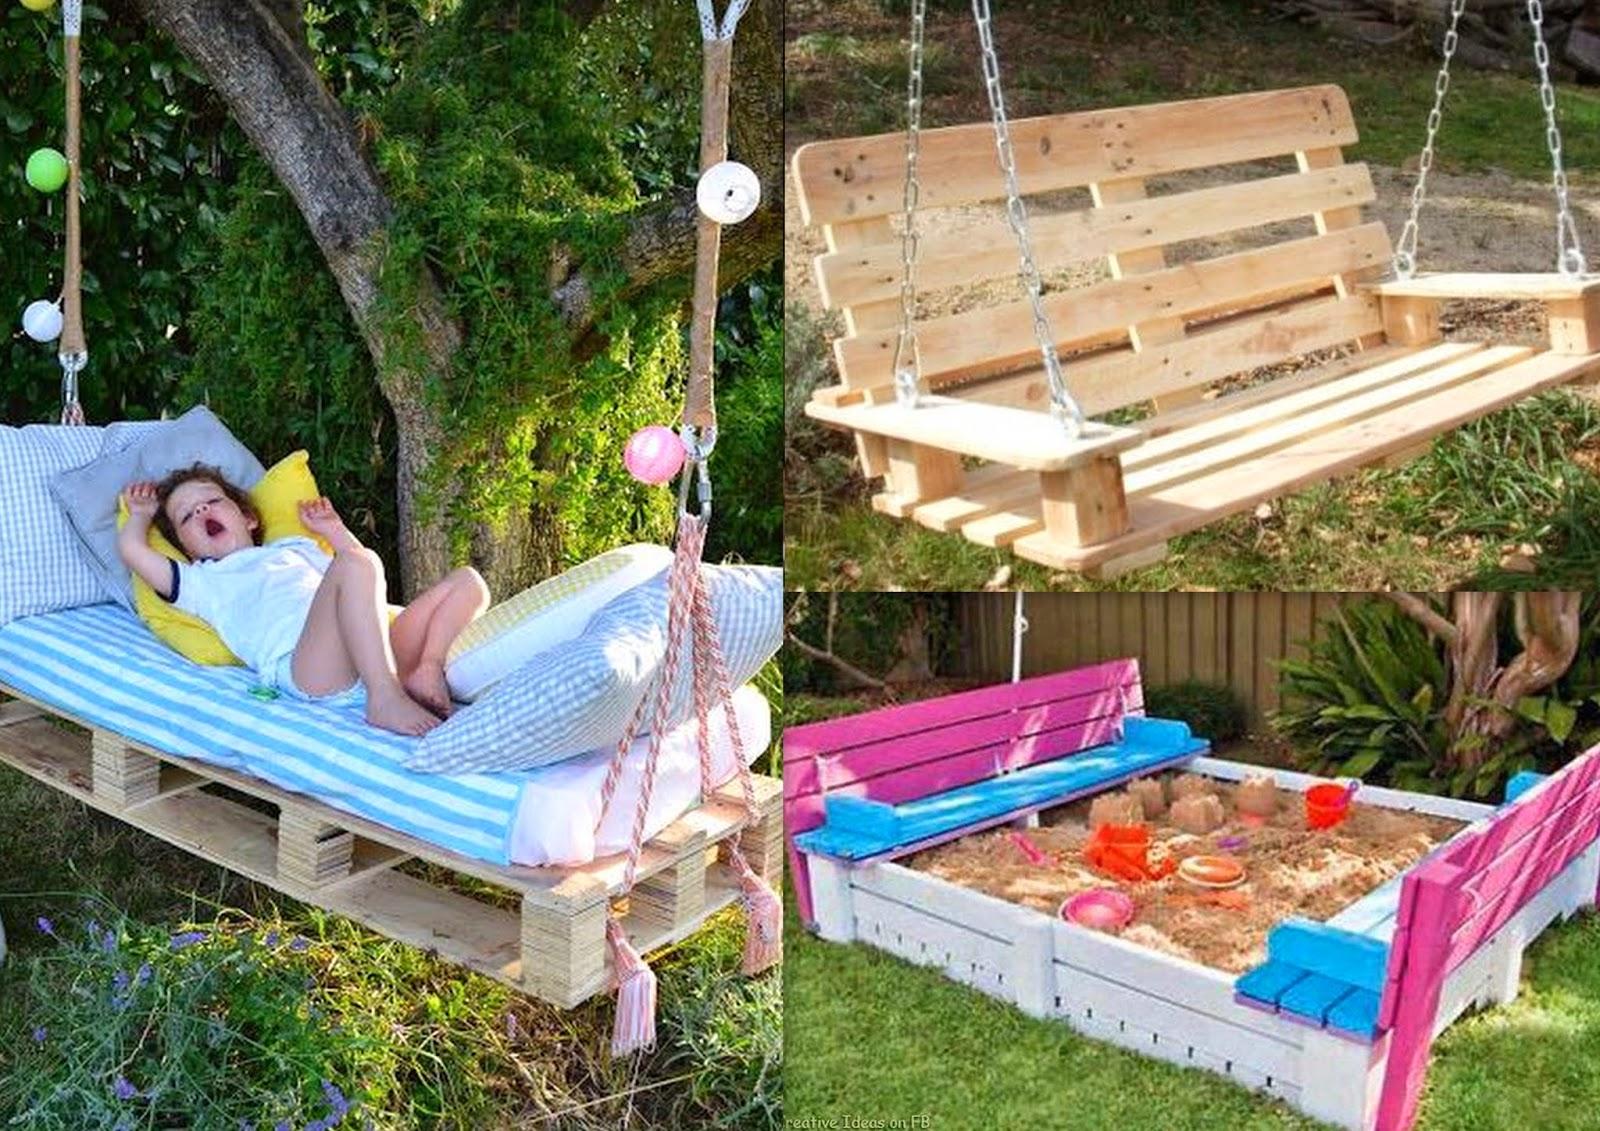 Home inspiration palety na balkon czy do ogrodu - Balkon inspiration ...